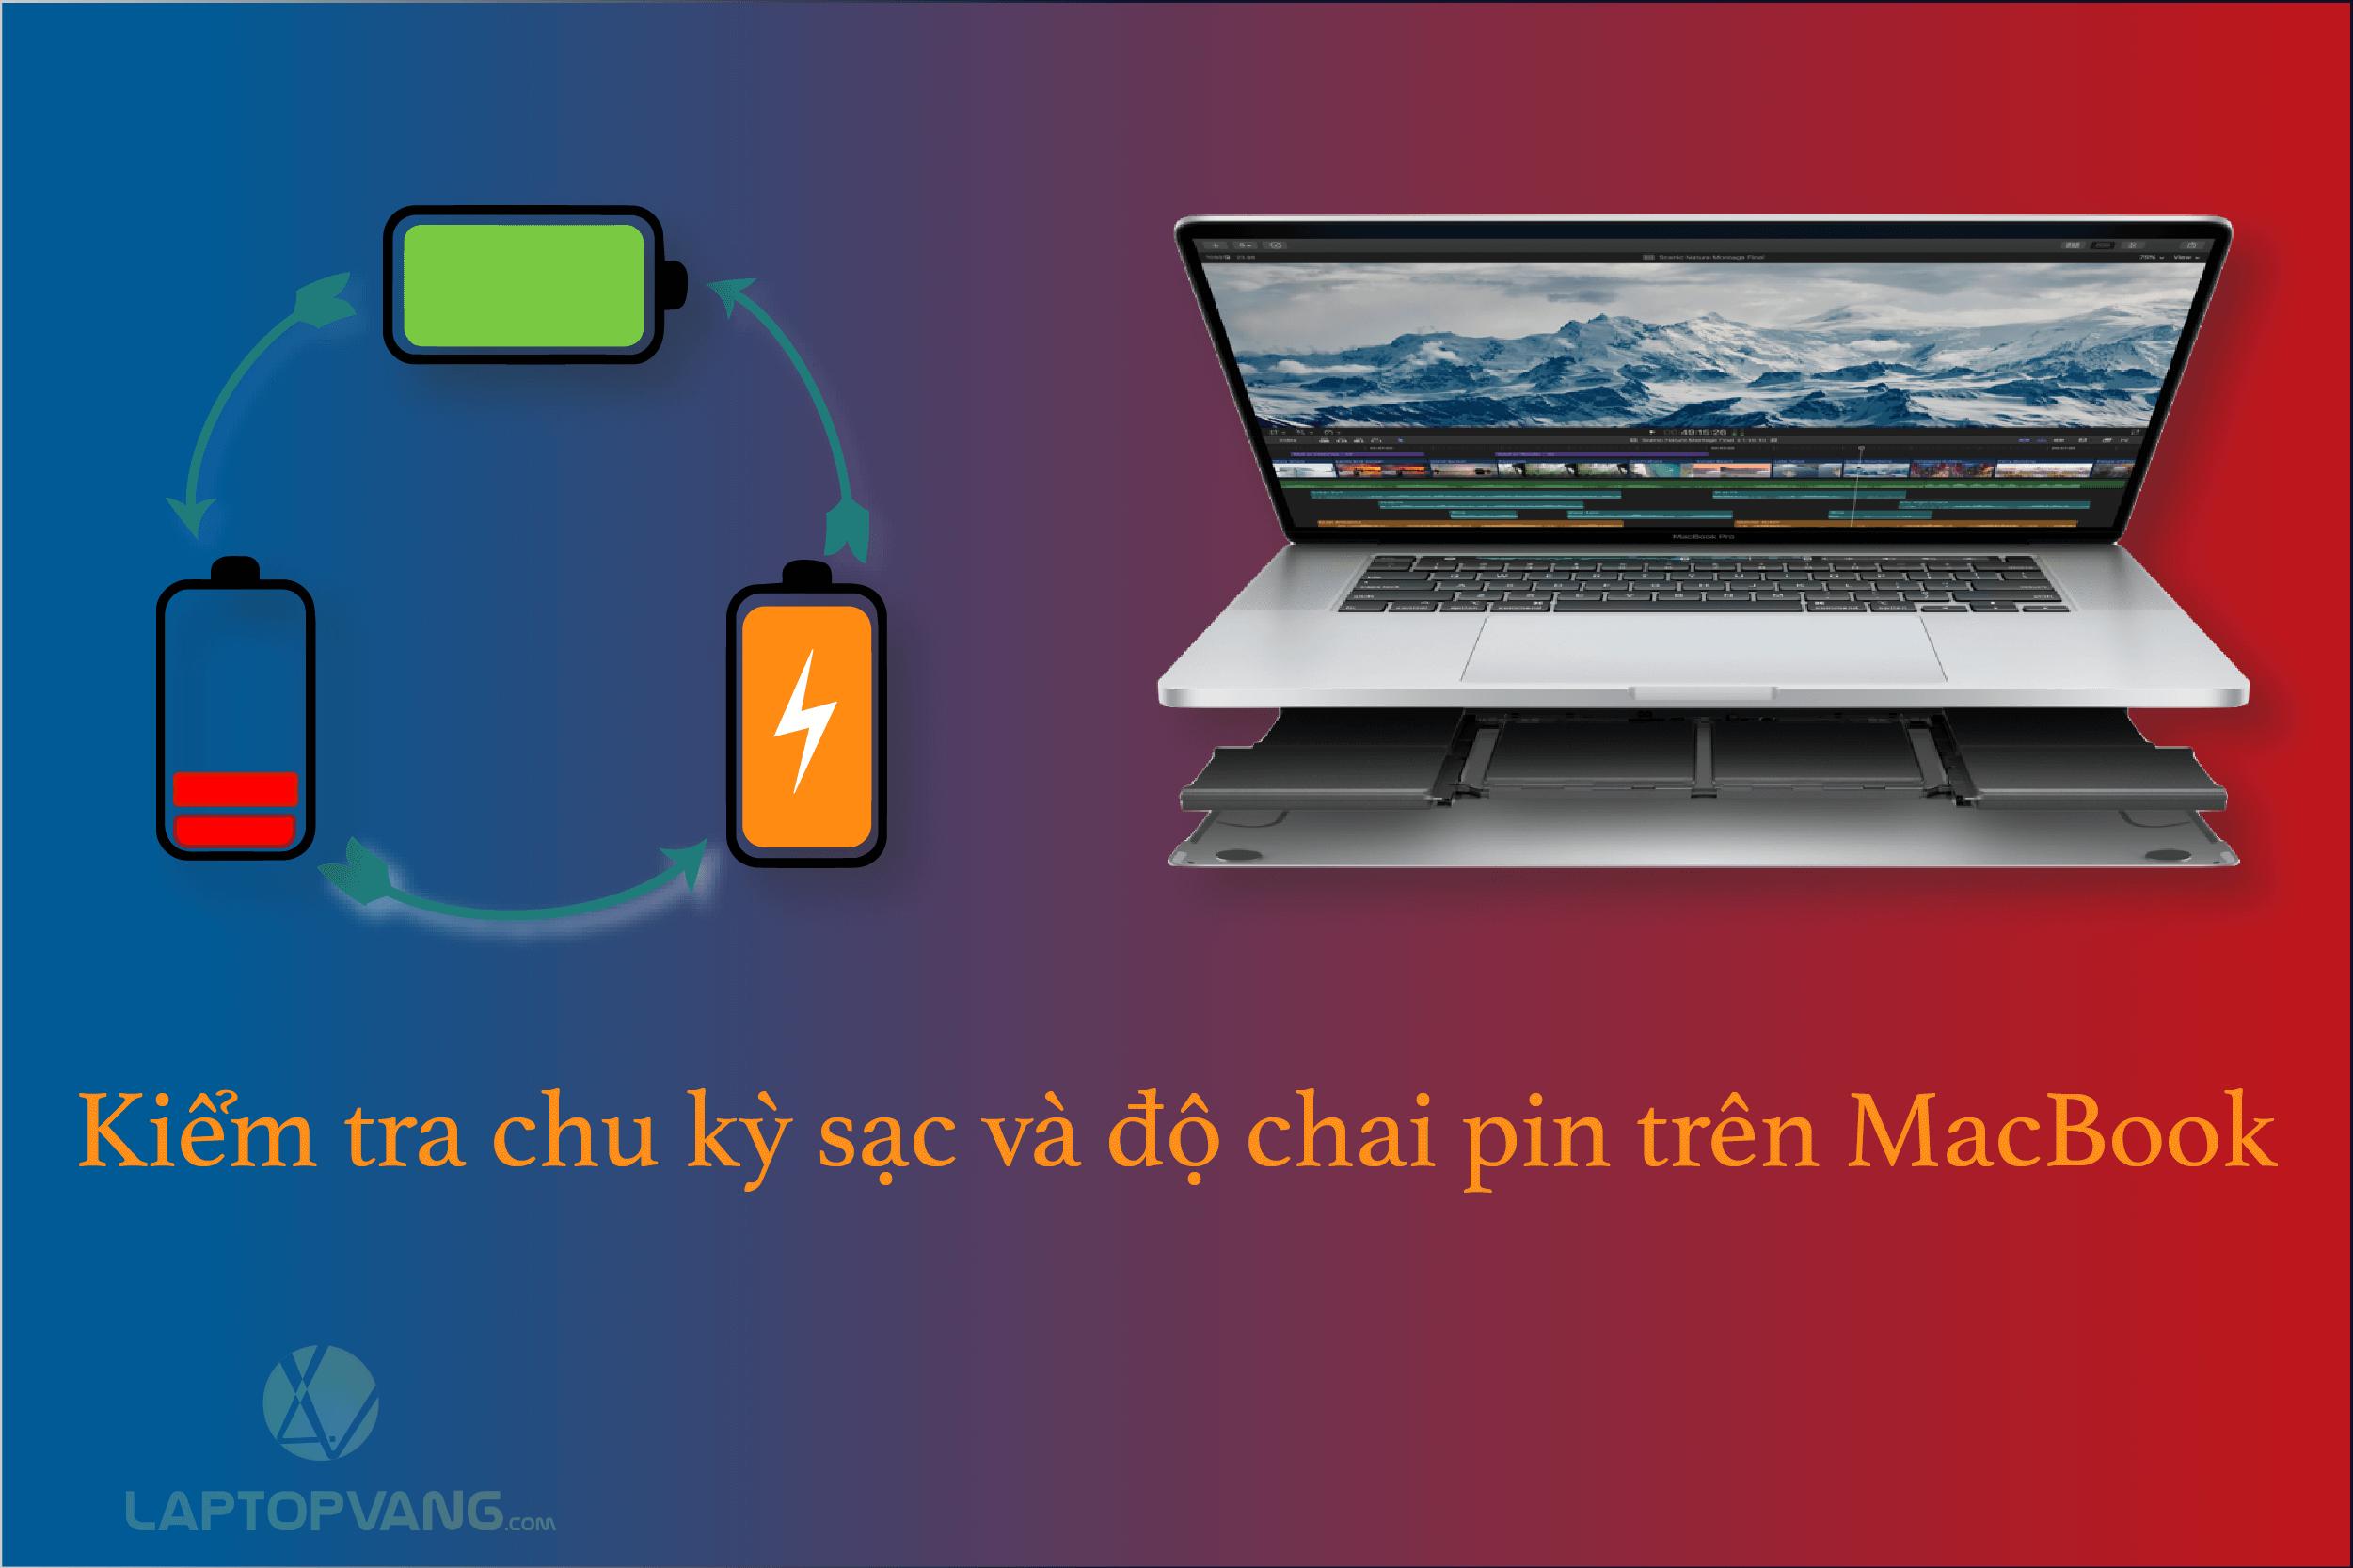 Chu kỳ sạc MacBook